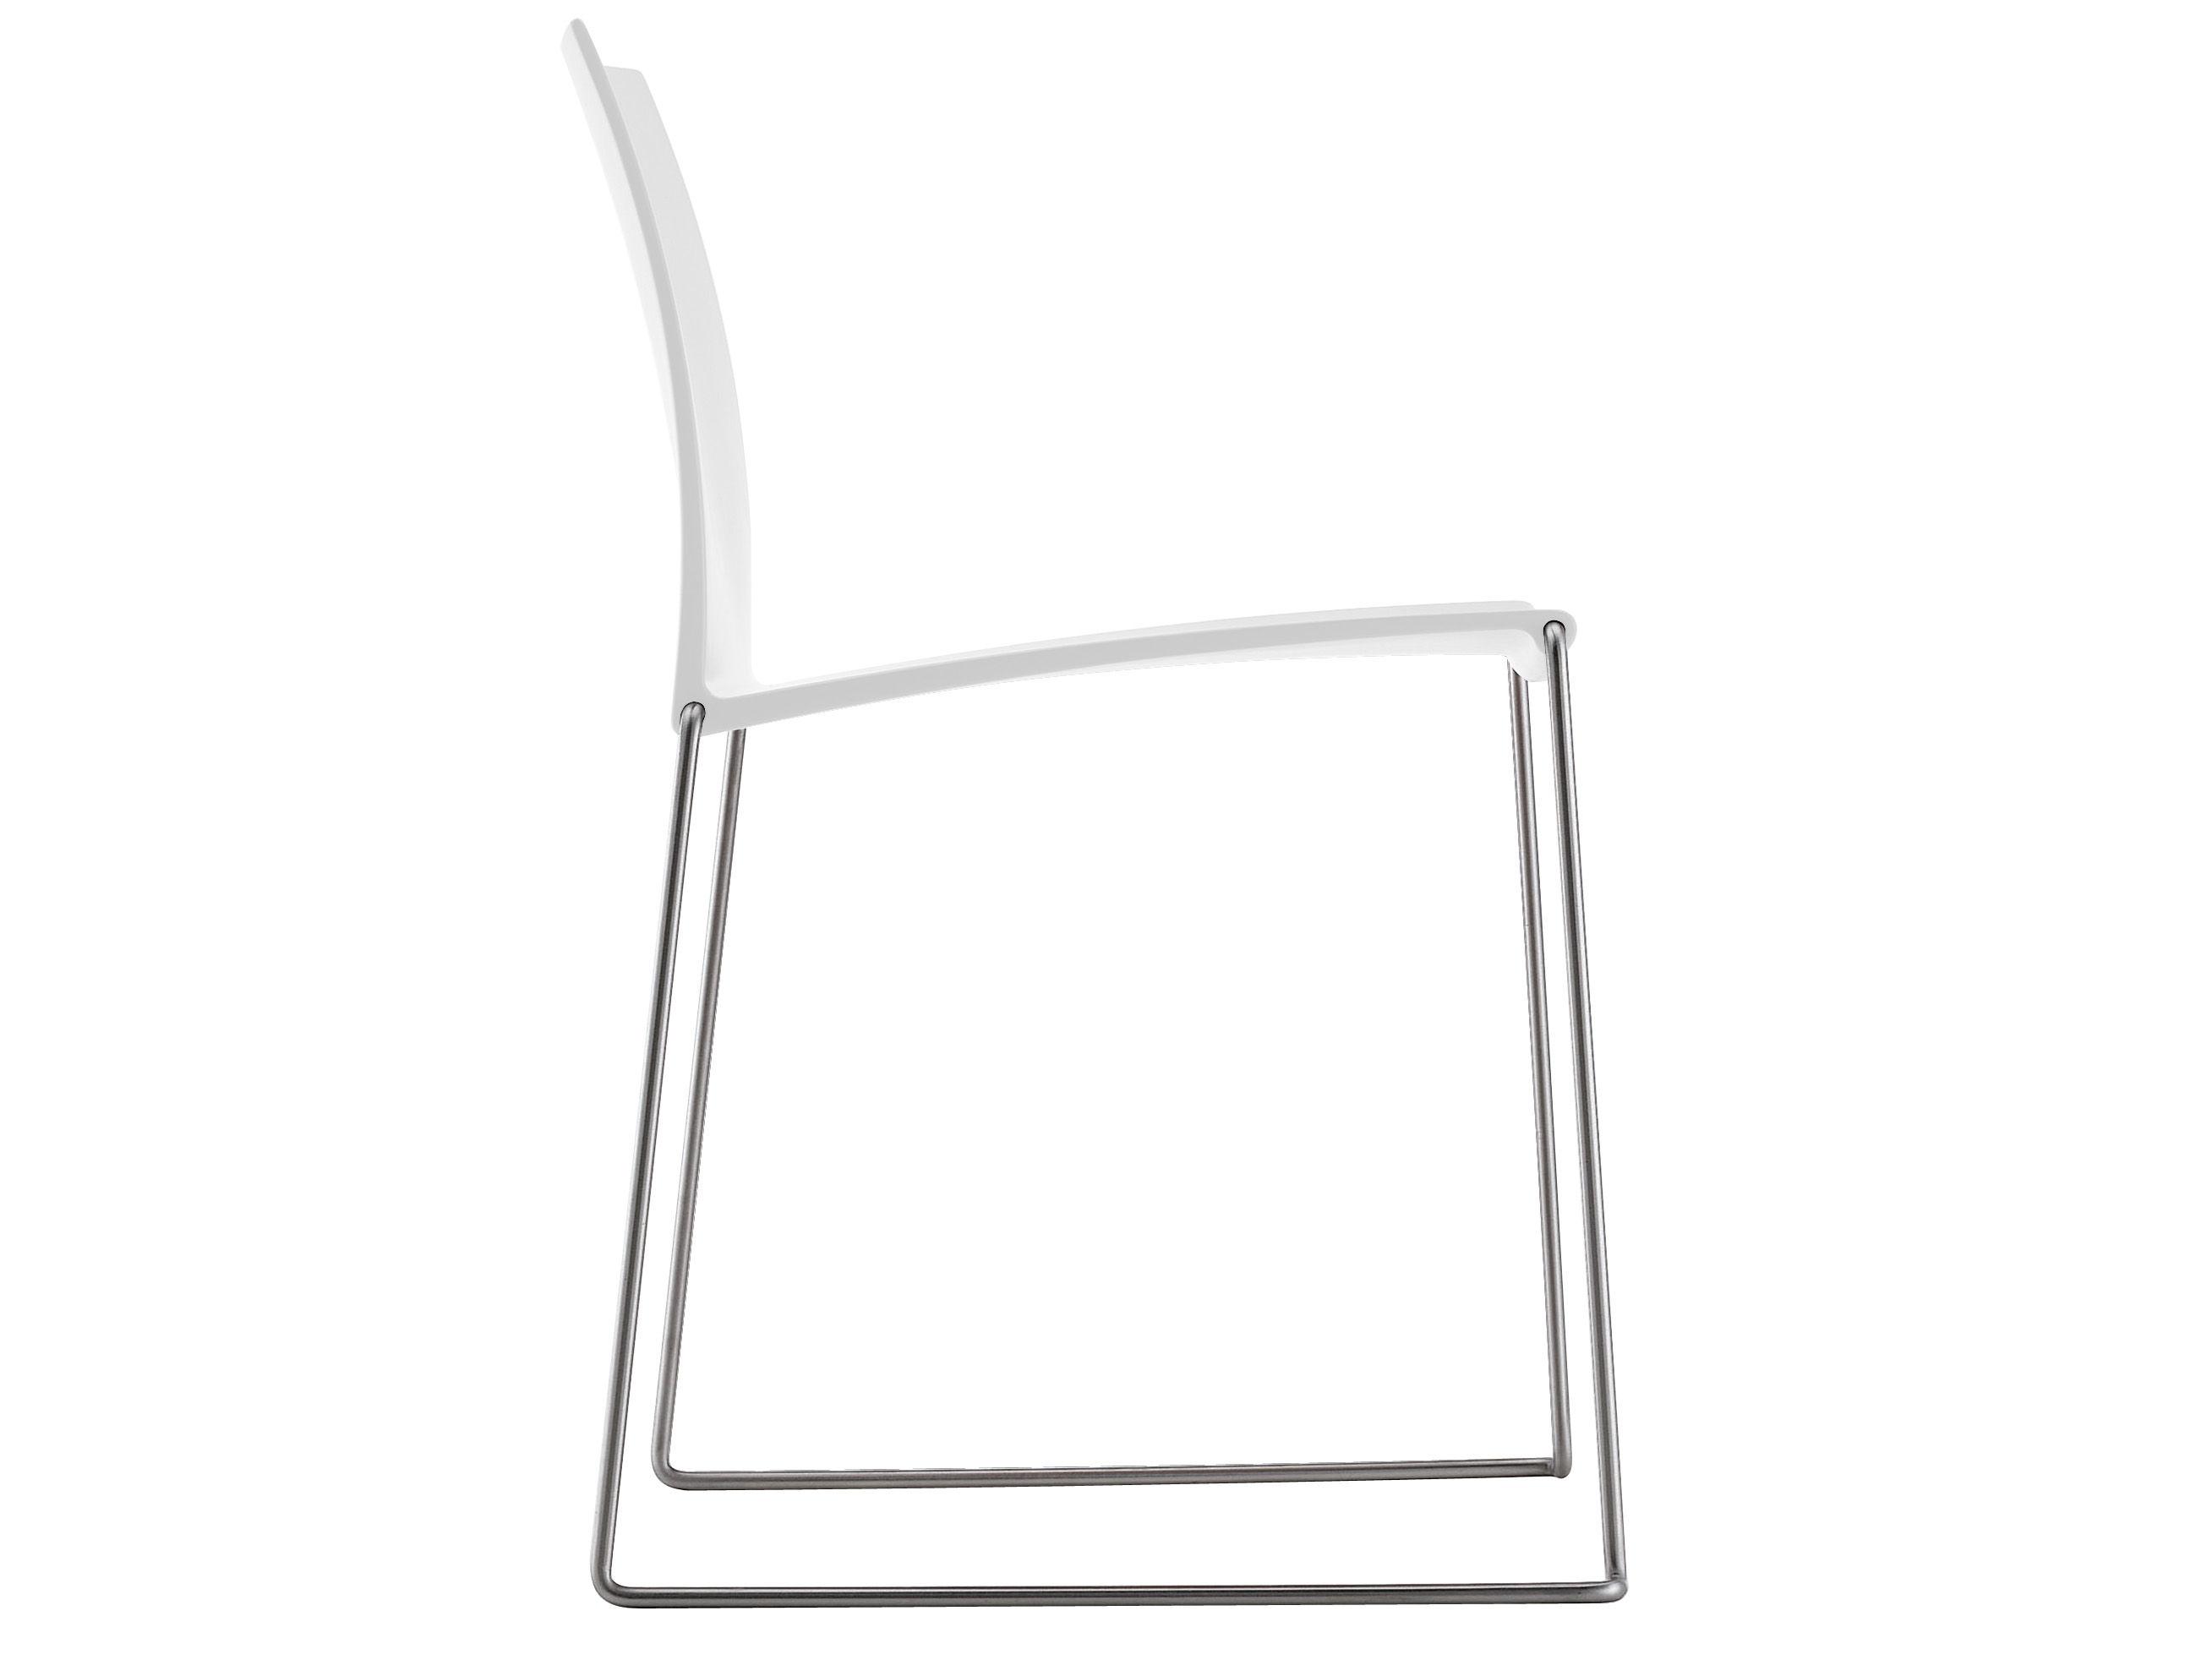 Möbel - Stühle  - M1 Stapelbarer Stuhl - MDF Italia - Weiß - Gestell aus Edelstahl - Plastikmaterial, rostfreier Stahl